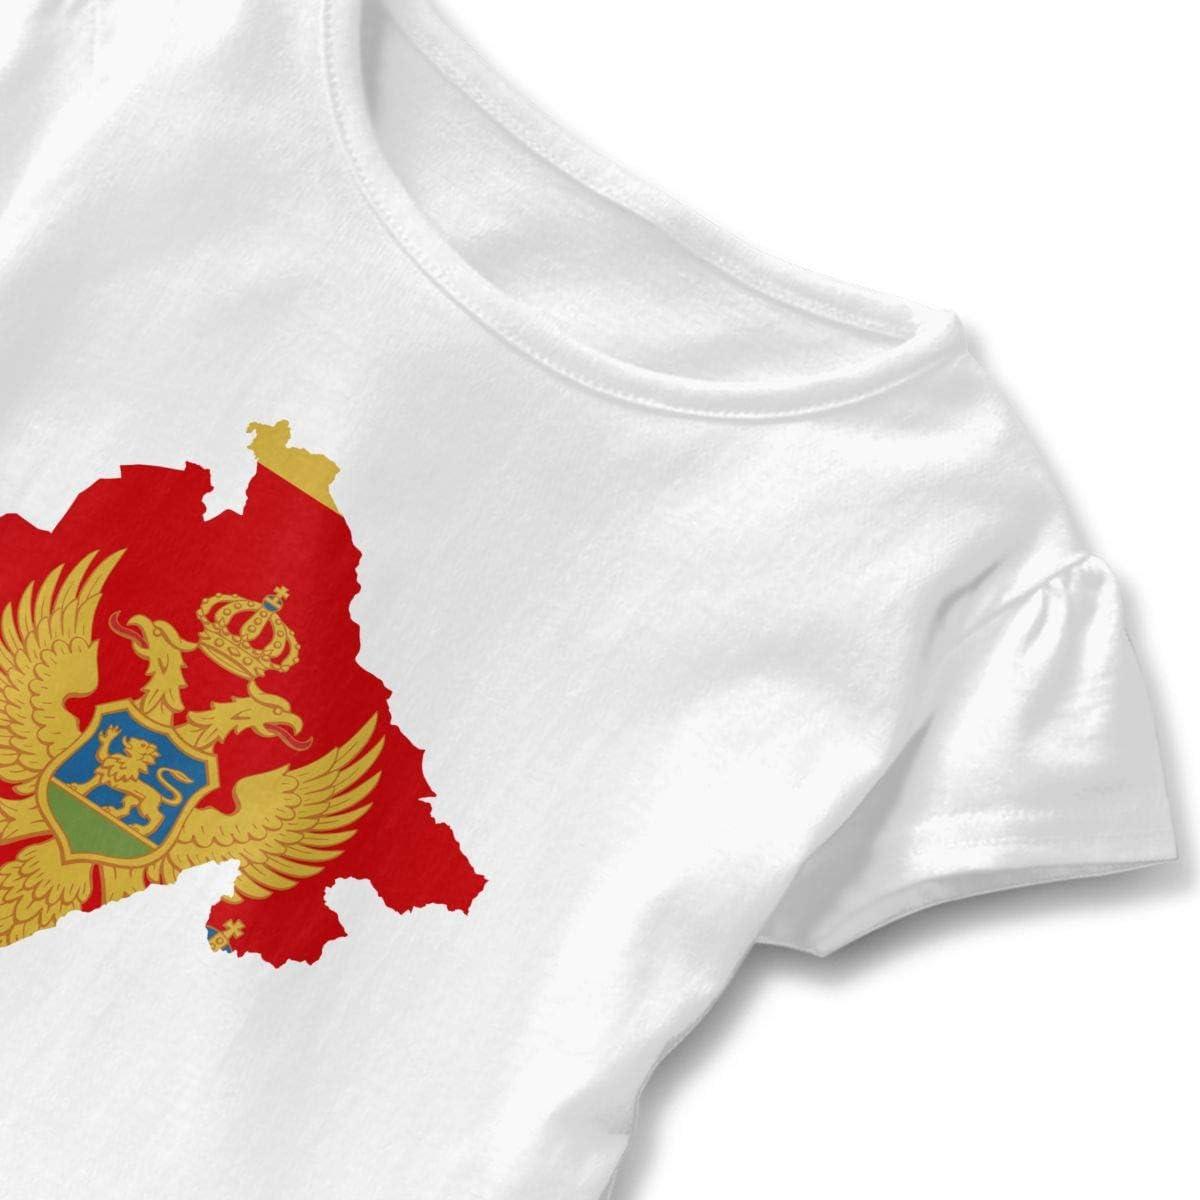 HZamara/_H Toddler Girls Flag Map of Montenegro Short Sleeve Ruffled T-Shirt Tops 2-6 Years